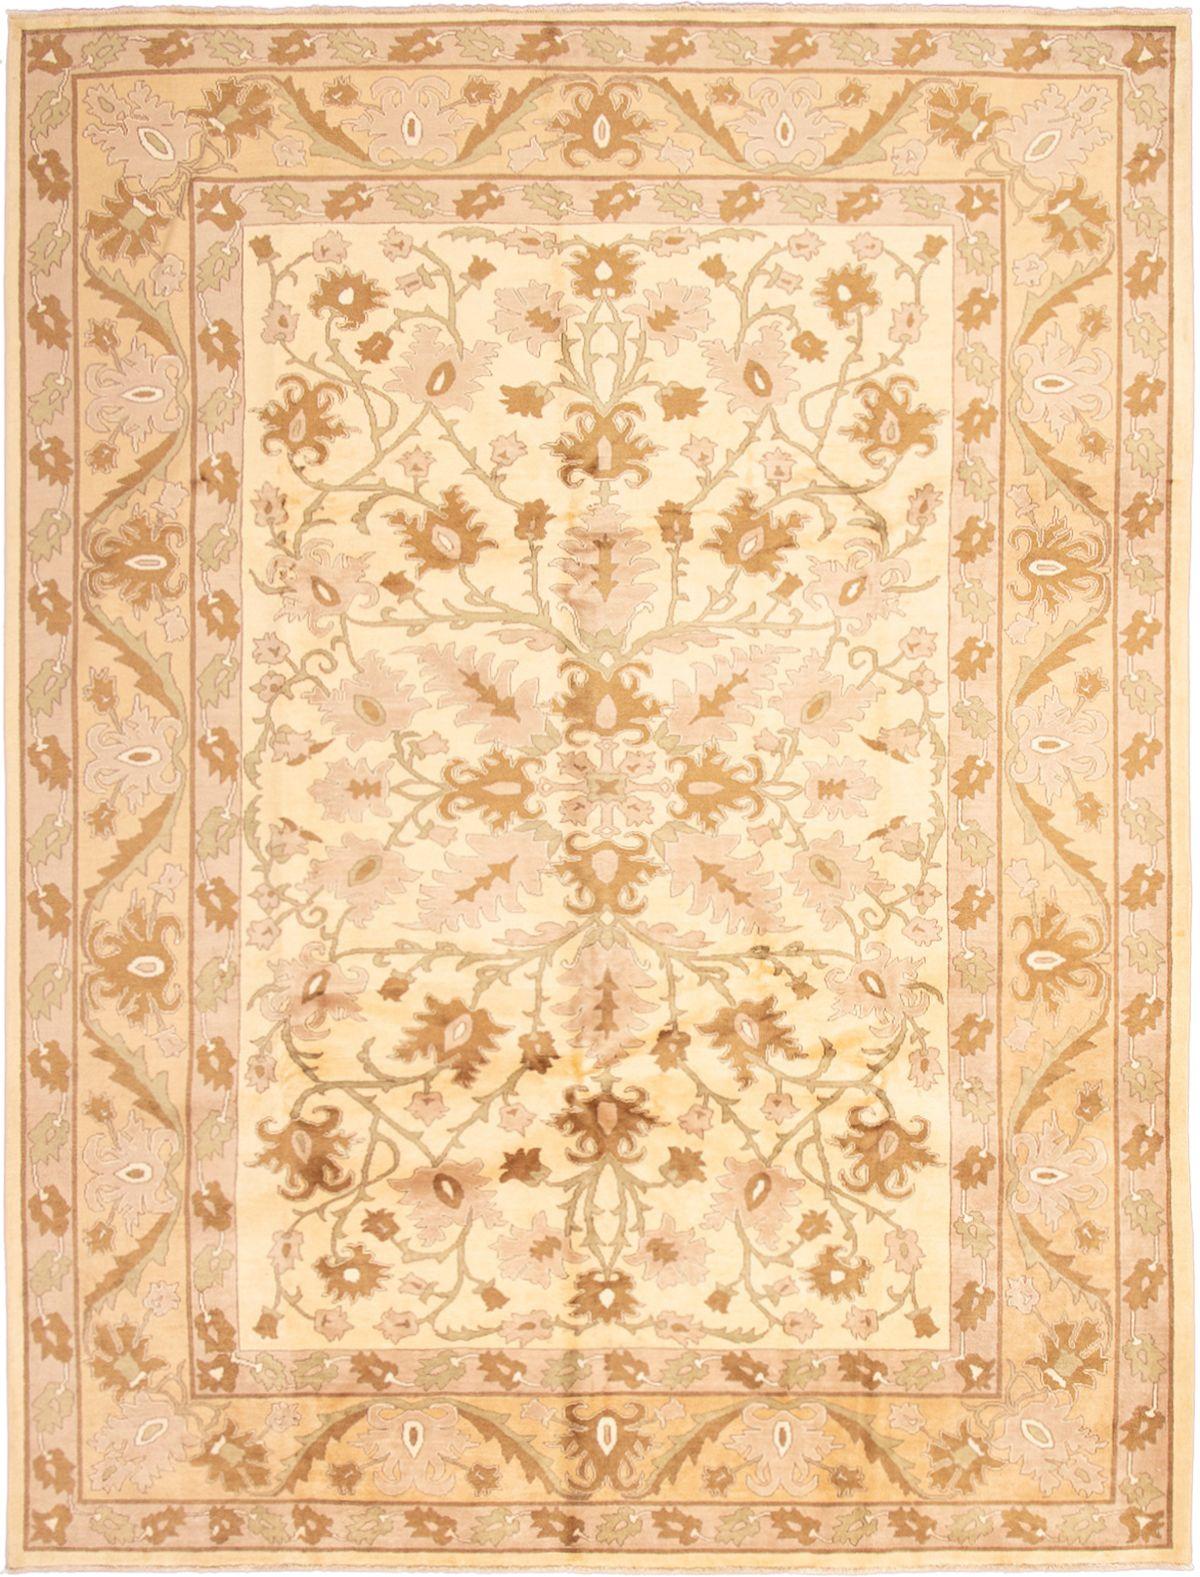 "Hand-knotted Chobi Twisted Ivory Wool Rug 10'1"" x 13'6"" Size: 10'1"" x 13'6"""